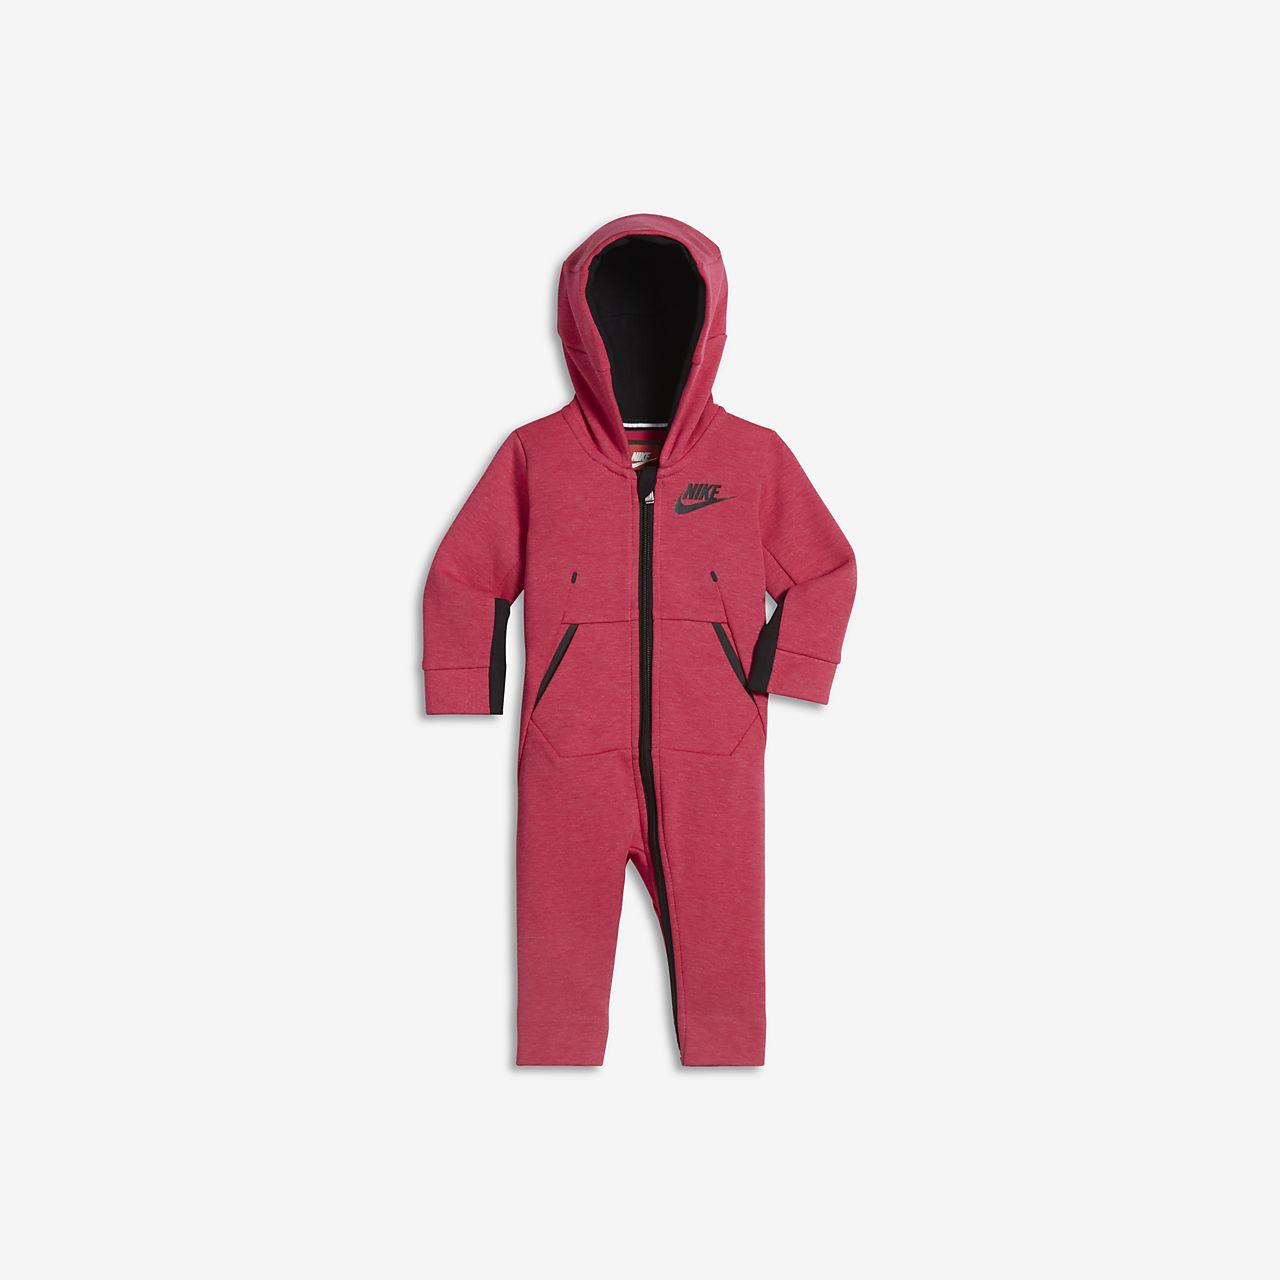 d643b4bbe692 Nike Sportswear Tech Fleece Granota amb caputxa - Nadó i infant ...